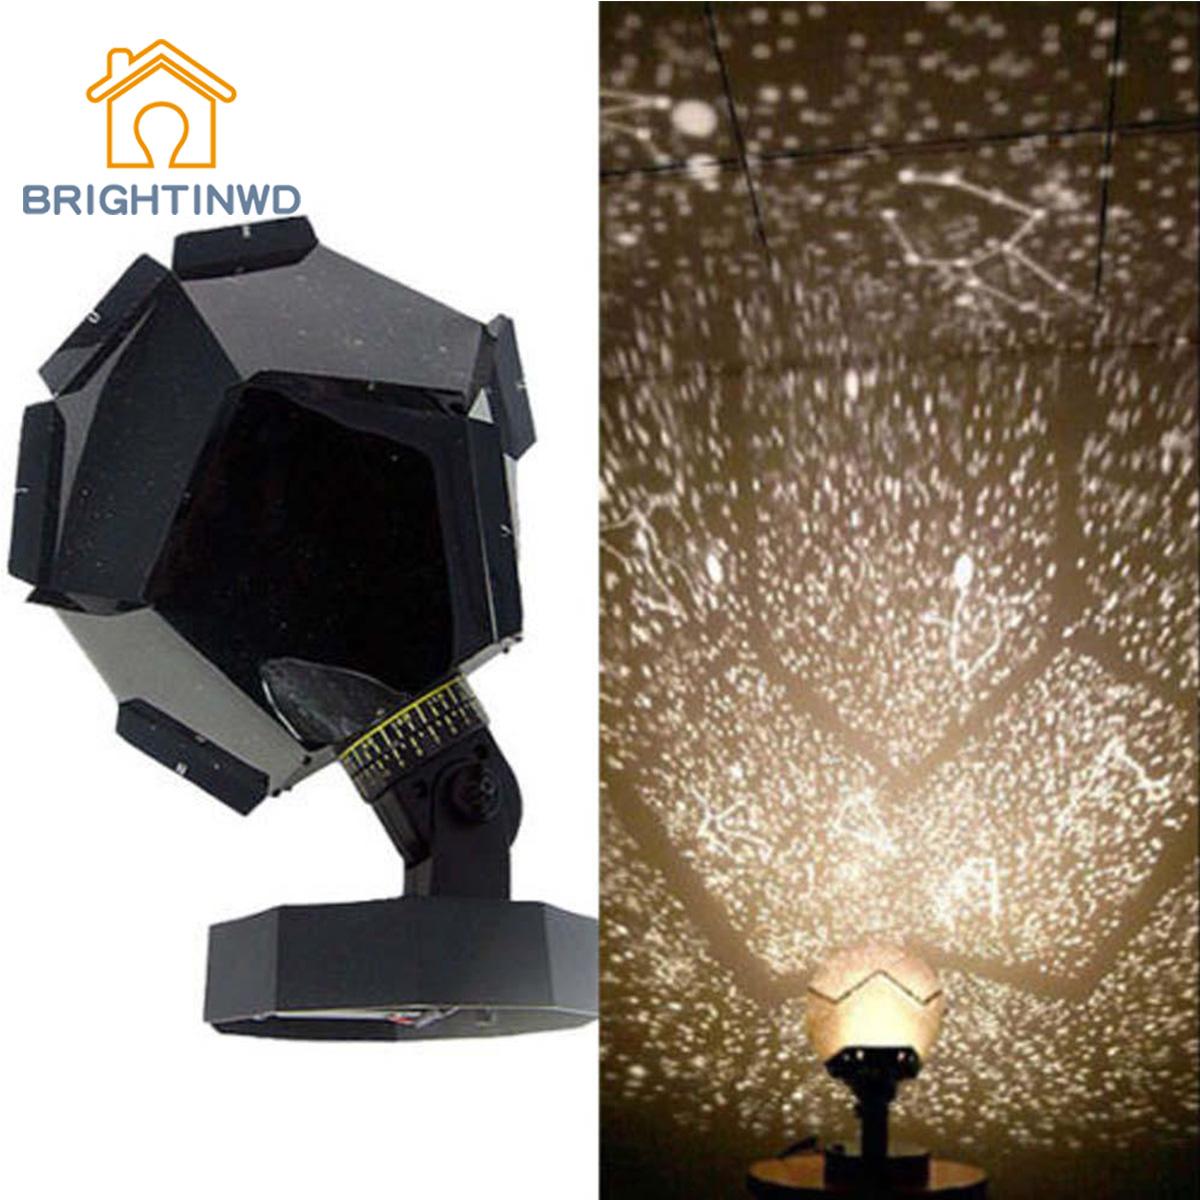 BRIGHTINWD Romantic Planetarium Star Stage Light Celestial Projector Cosmos Night Light Sky Lamp